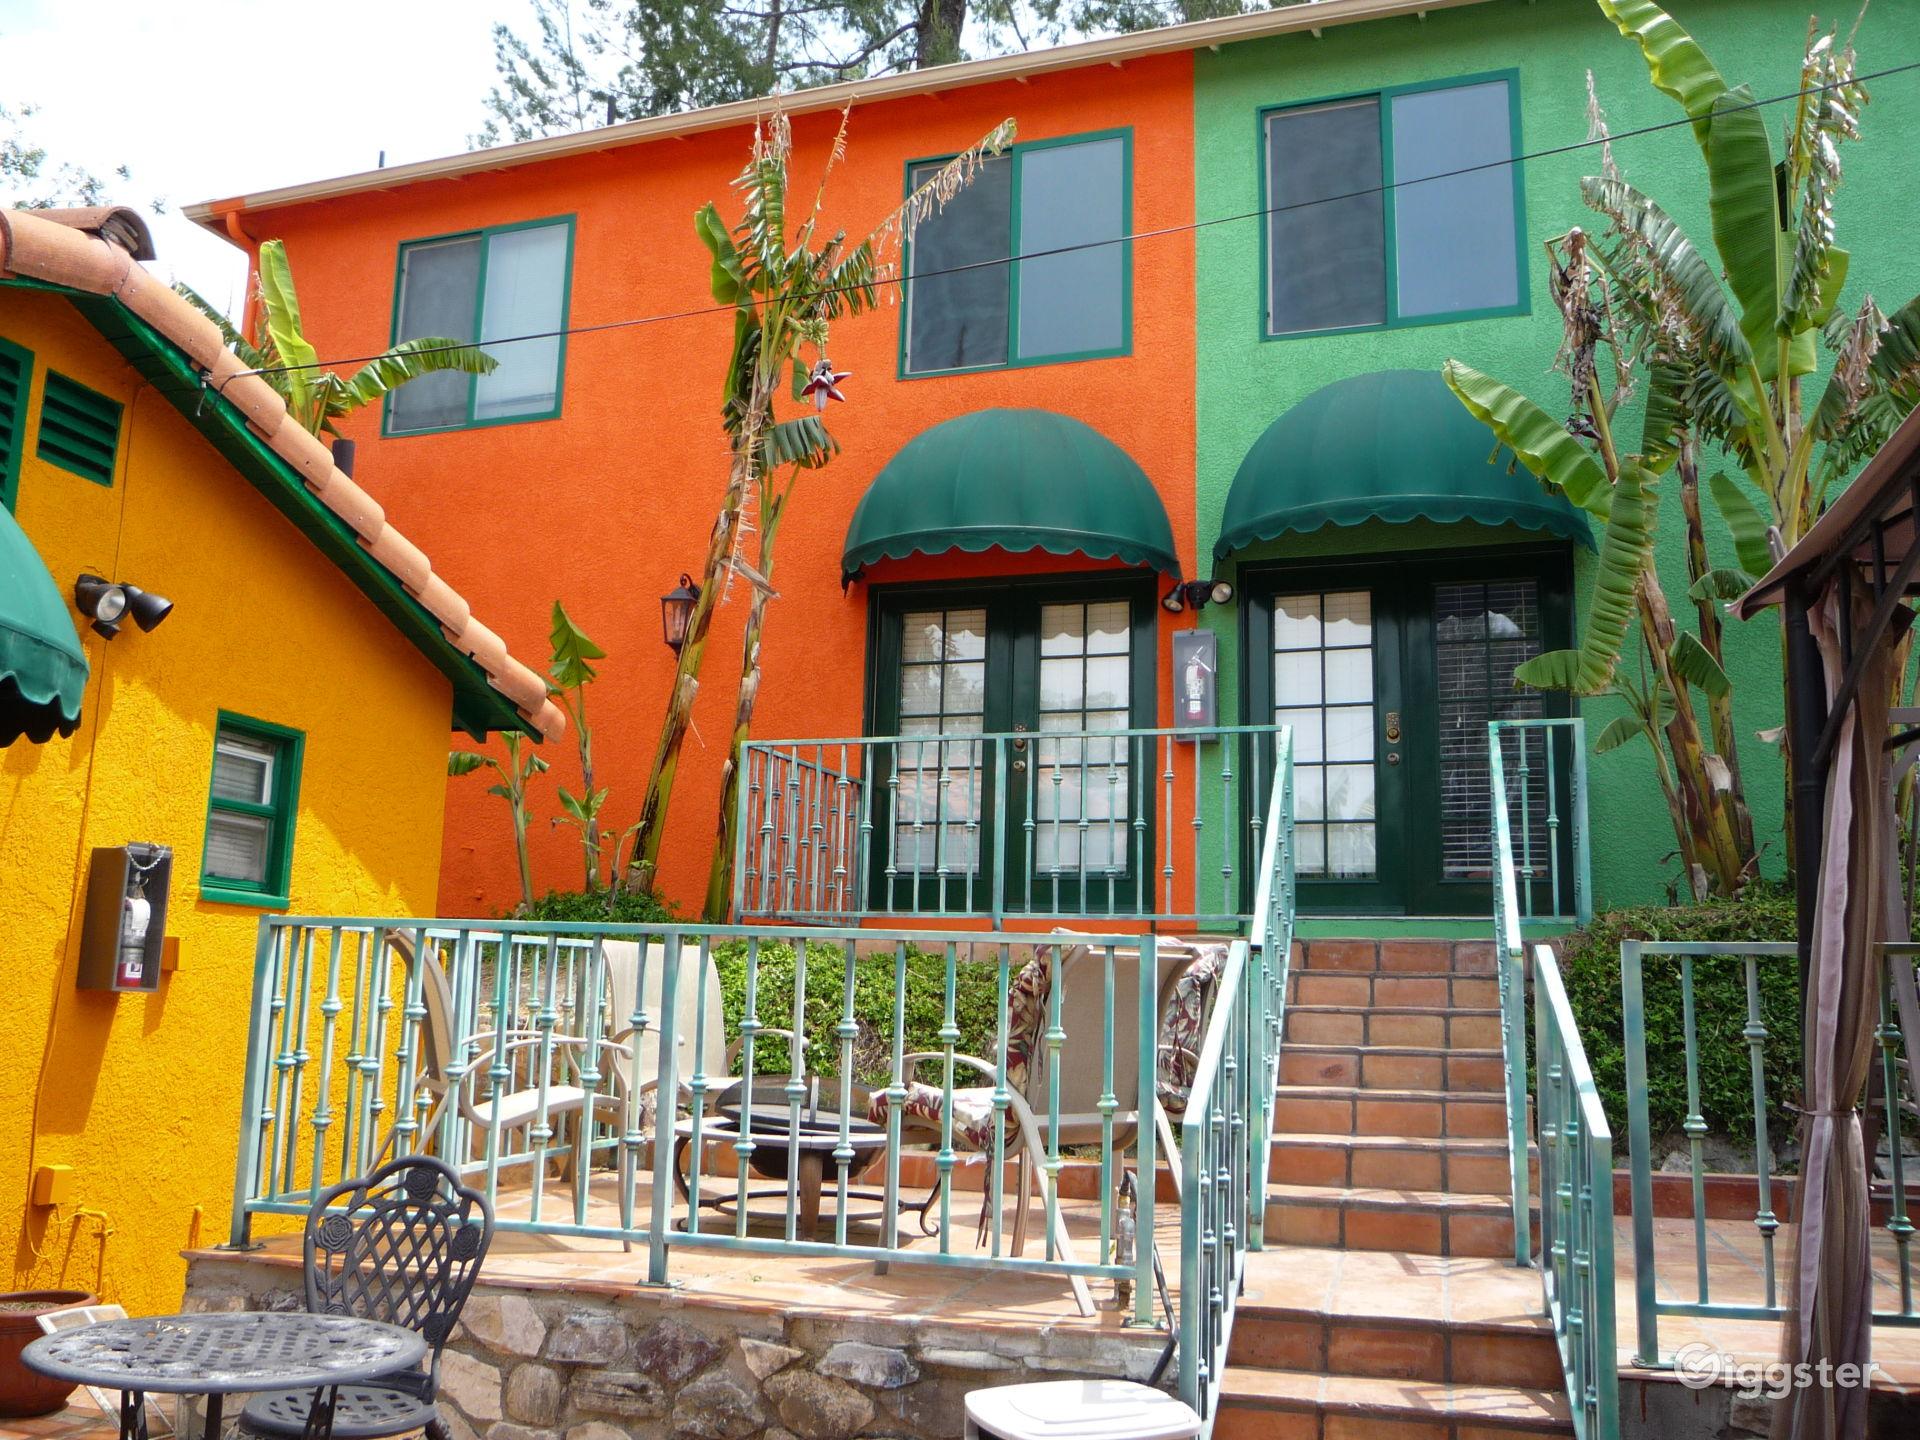 Turnkey Loft Guest House in a Tropical Resort near Woodland Hills Los Angeles Rental